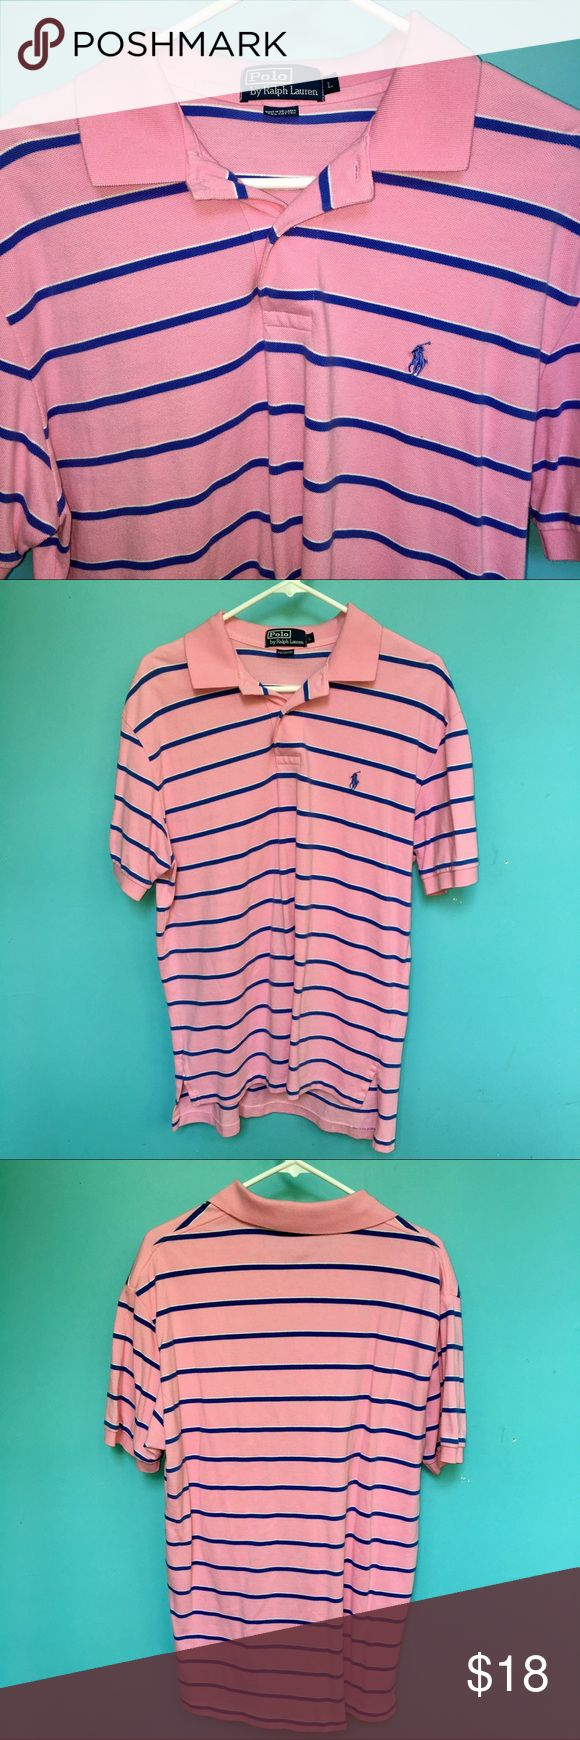 Polo Ralph Lauren Pink Polo Shirt Men's L Polo Ralph Lauren Pink Polo Shirt Men's L in very good condition Polo by Ralph Lauren Shirts Polos